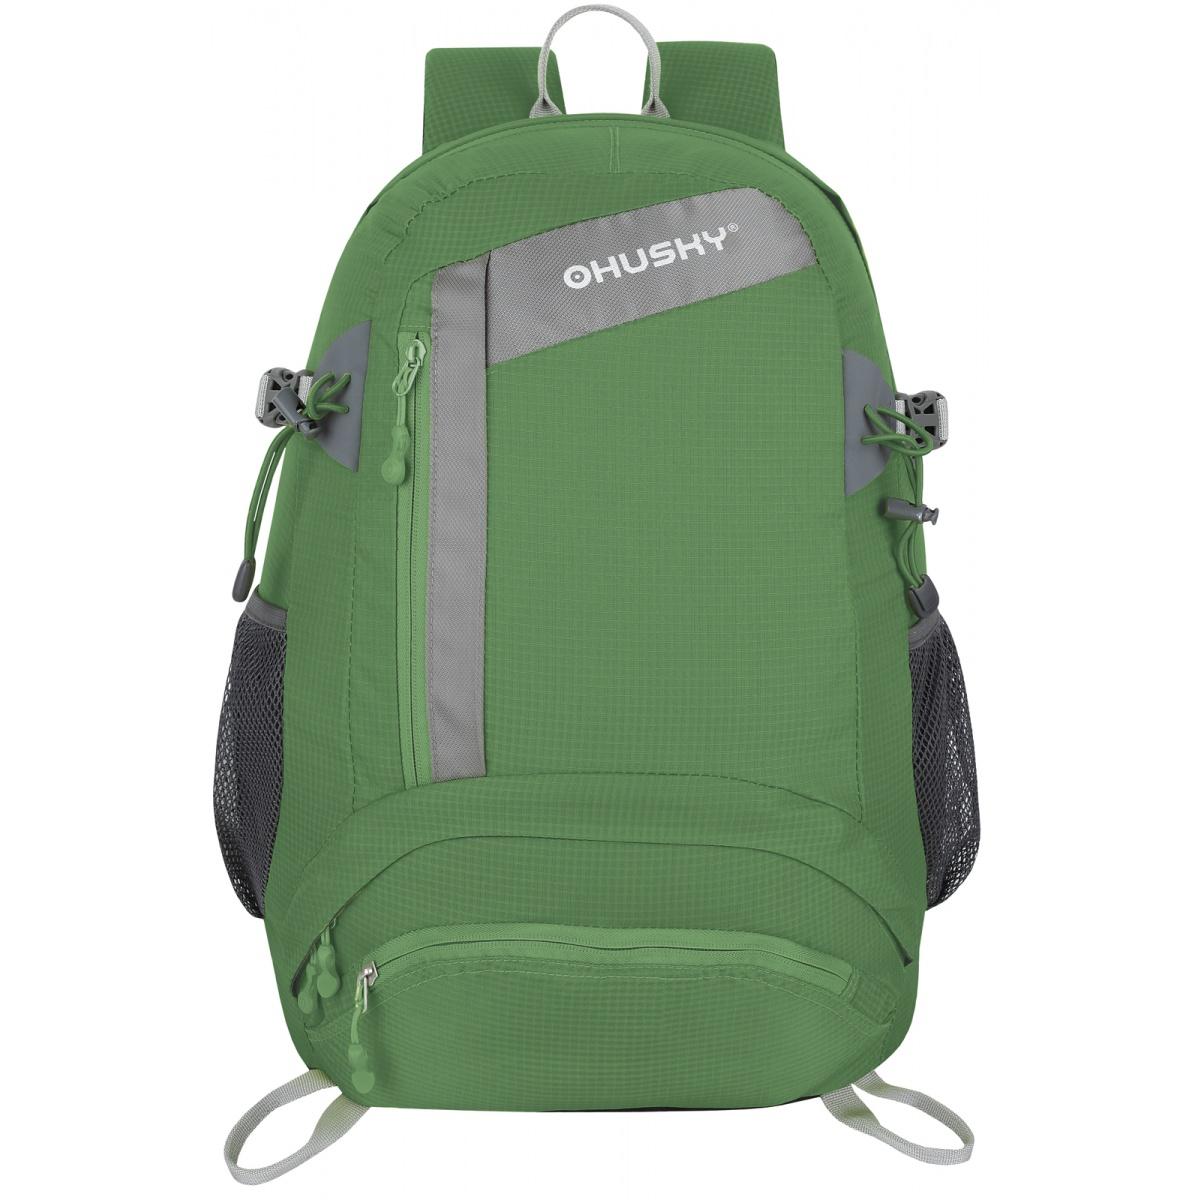 c99a6ac8d2 Batoh Turistika - Stingy 28l – zelená